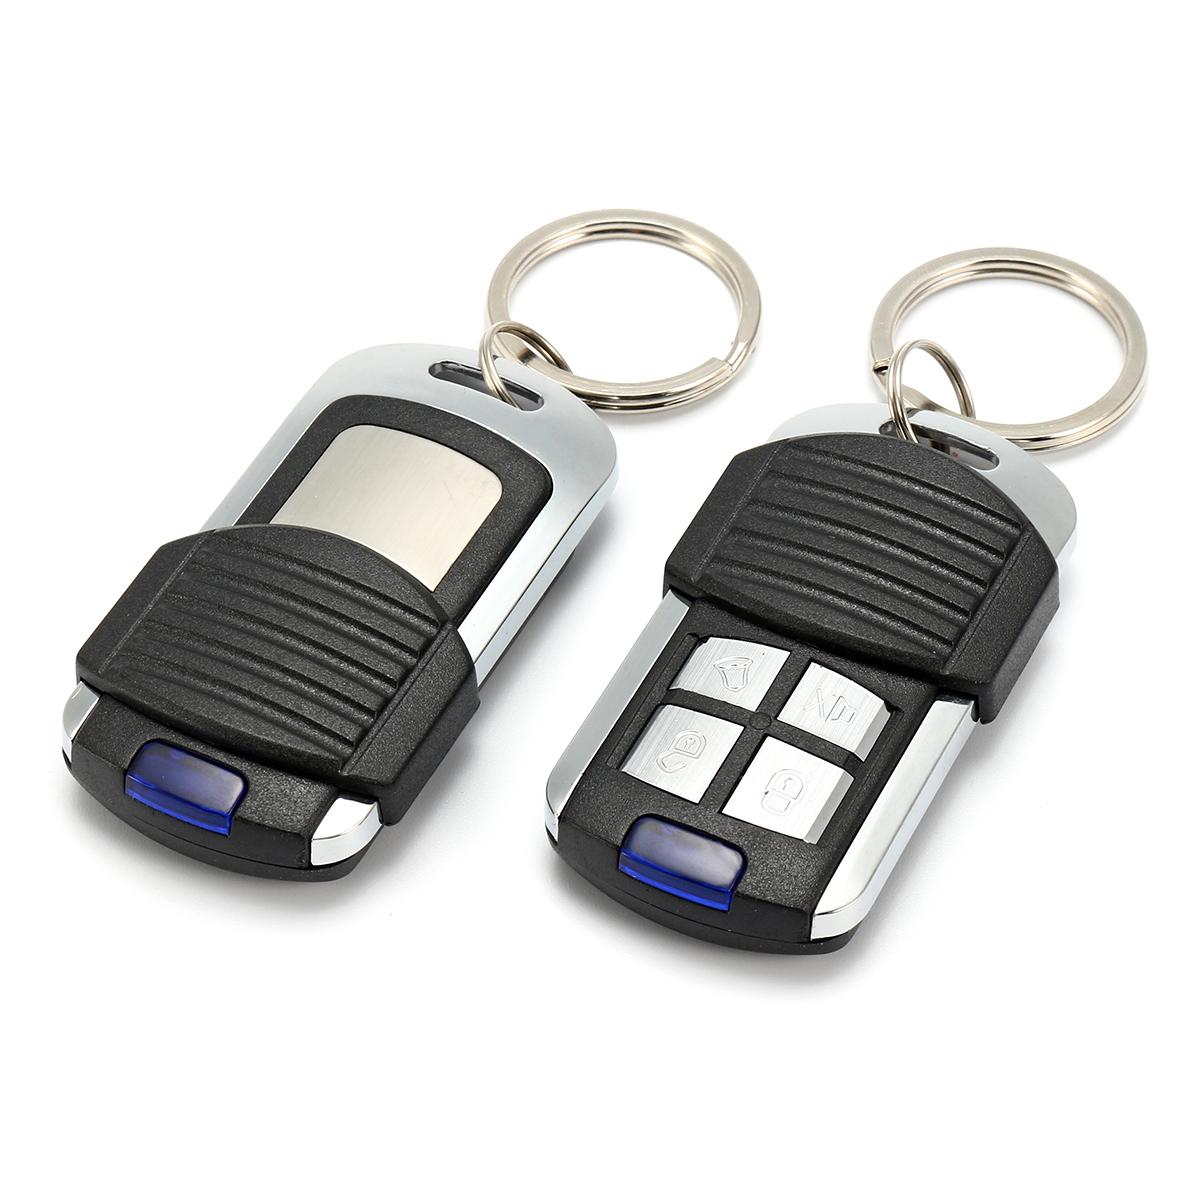 Universal Car Remote Central Set Door Lock Smart Vehicle Keyless Entry System